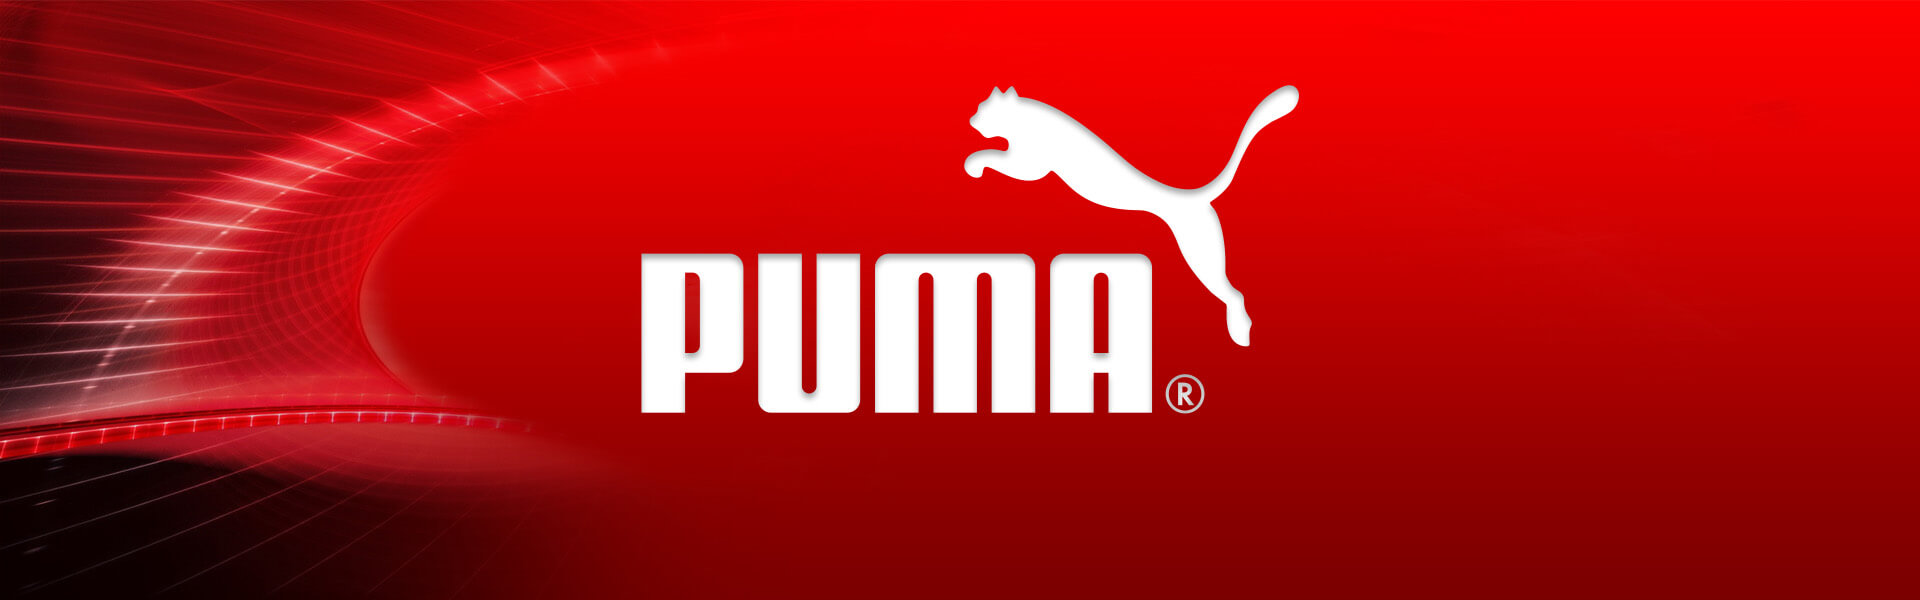 Case Study PUMA B2B E Business Headline